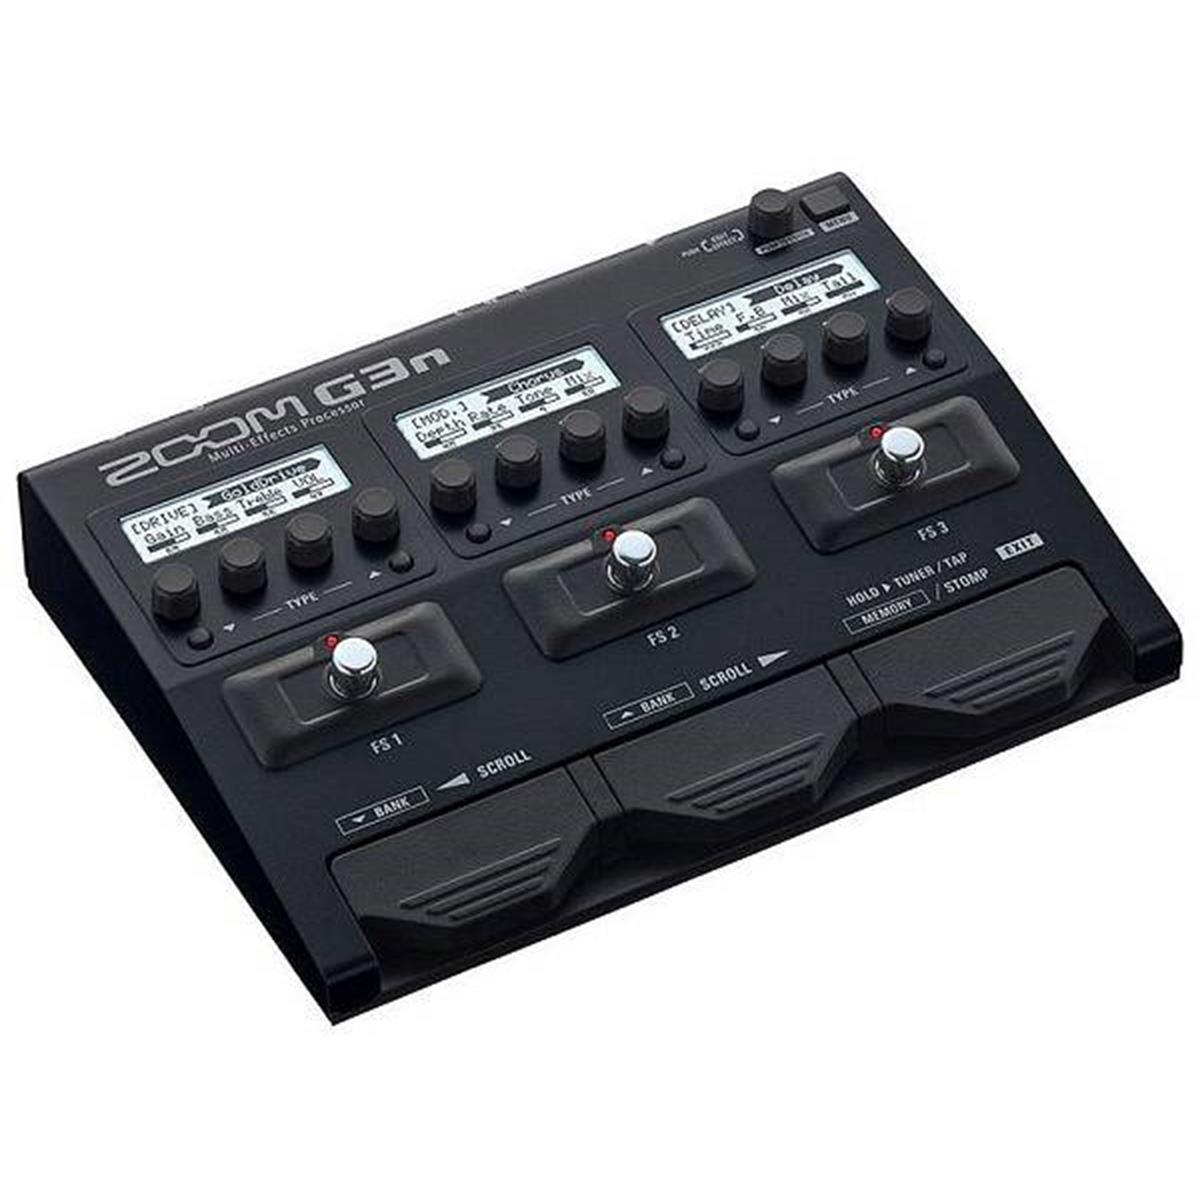 ZOOM G3n - pedaliera multieffetto. amp-simulator